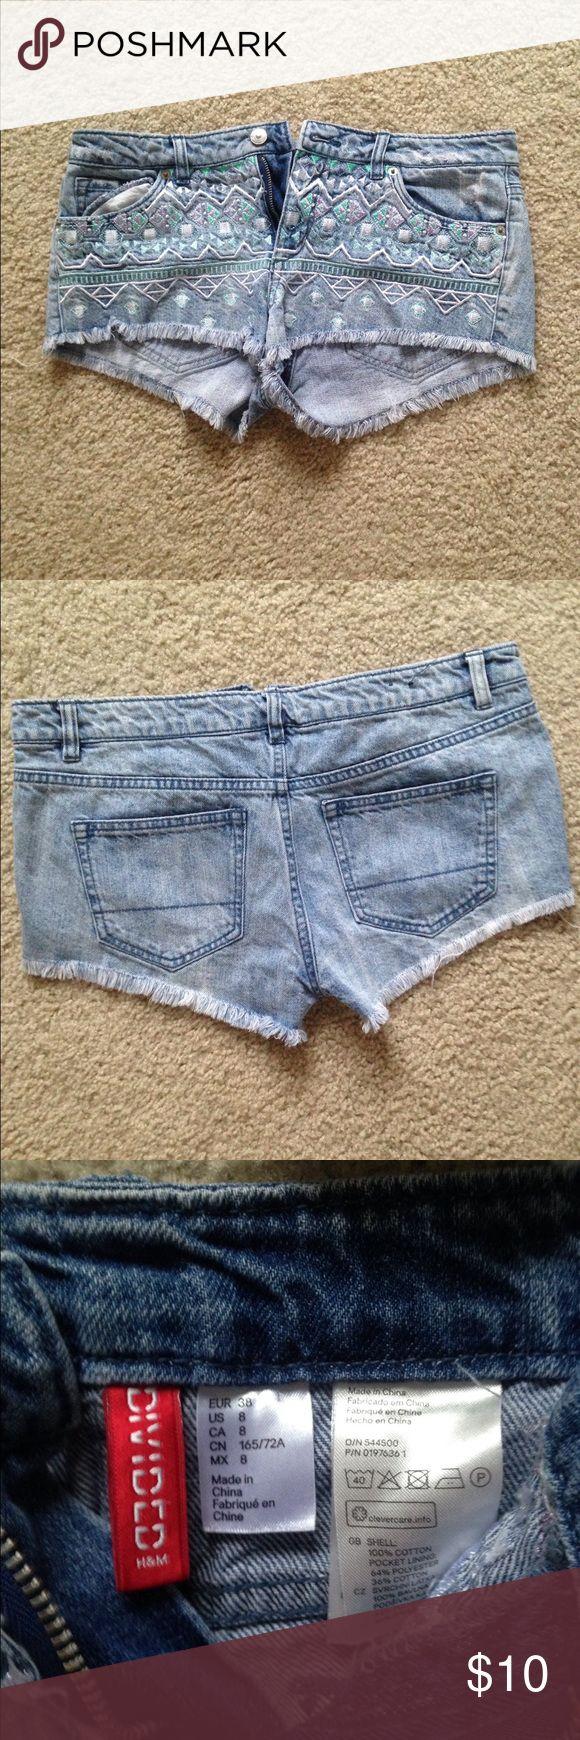 H&M jean shorts size size8 daisy duke style H&M jean shorts size size8 daisy duke style cut off shorts used H&M Shorts Jean Shorts